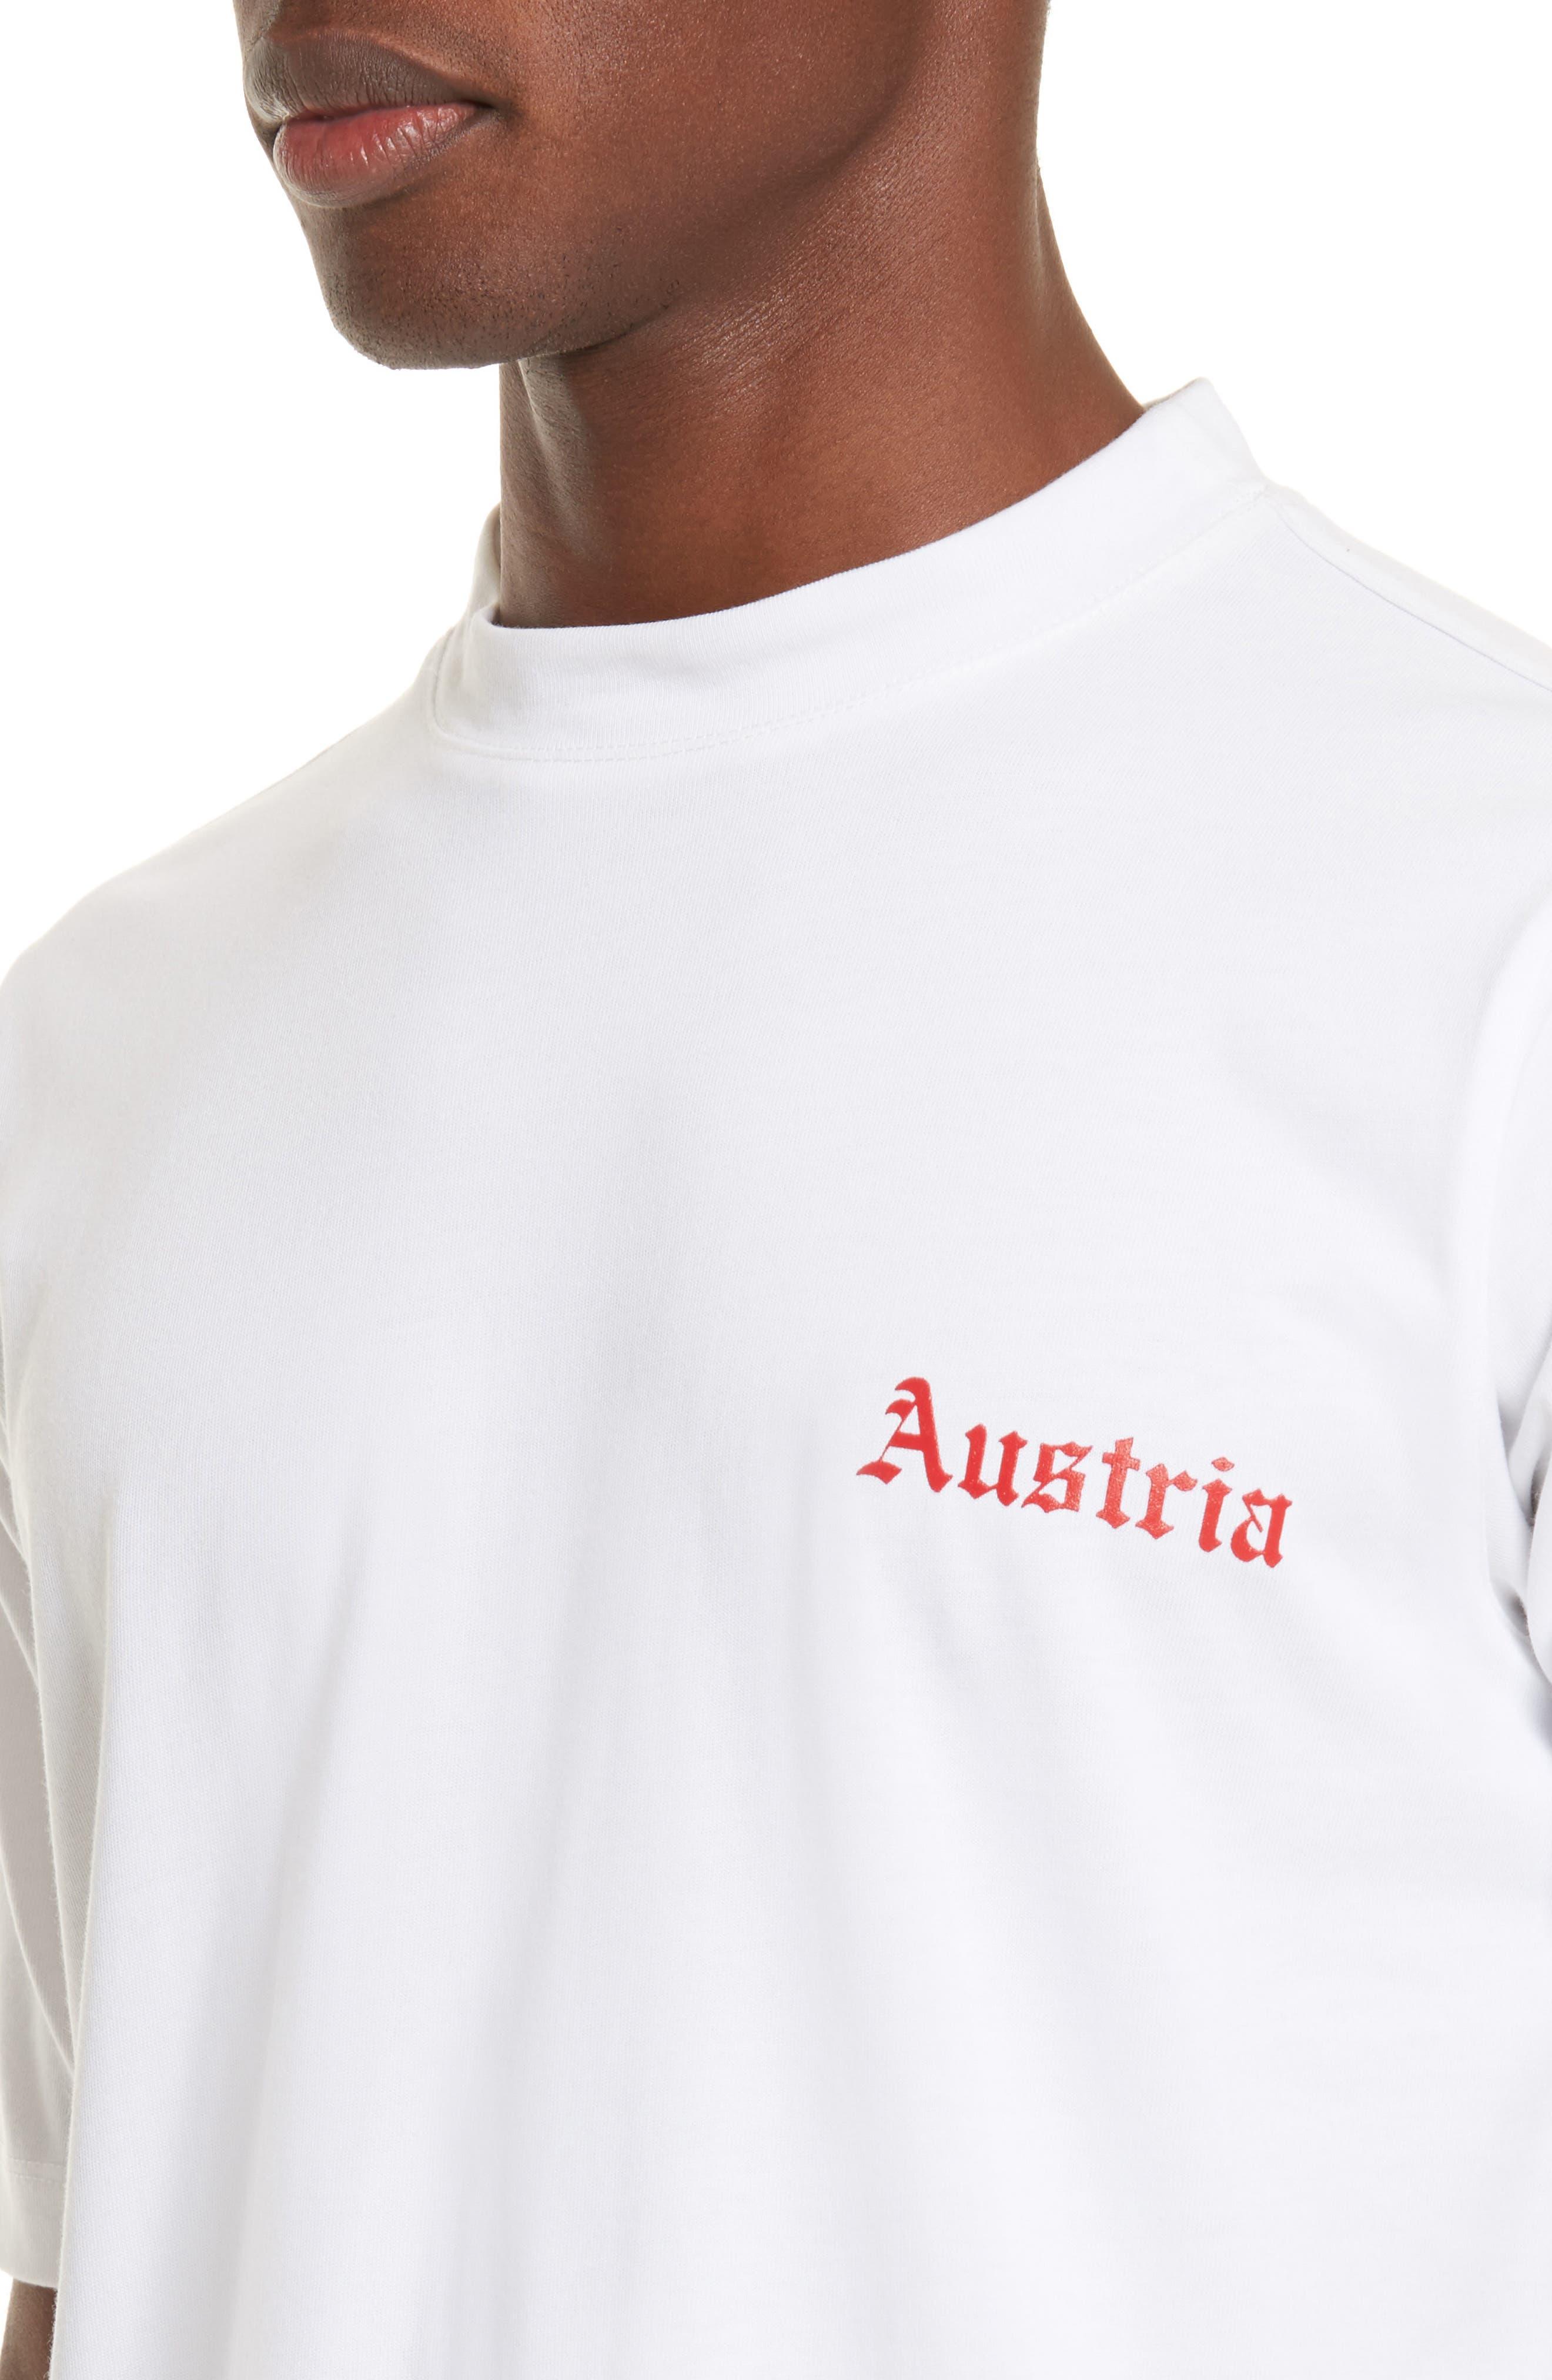 Austria Tall T-Shirt,                             Alternate thumbnail 4, color,                             100